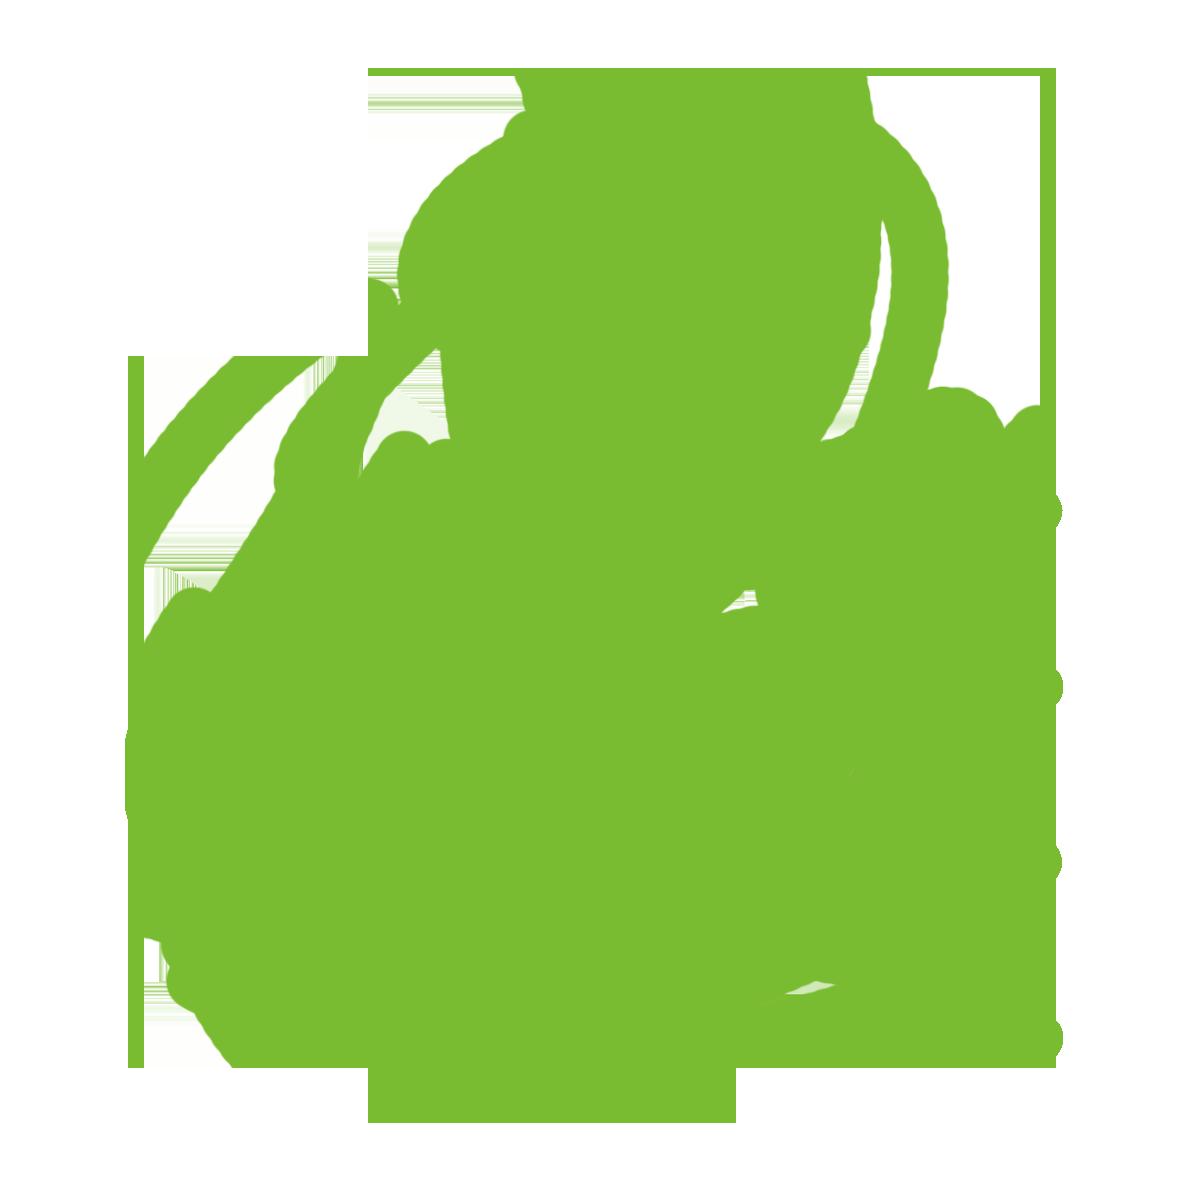 Curriculum clipart curriculum development. Welcome to green ninja